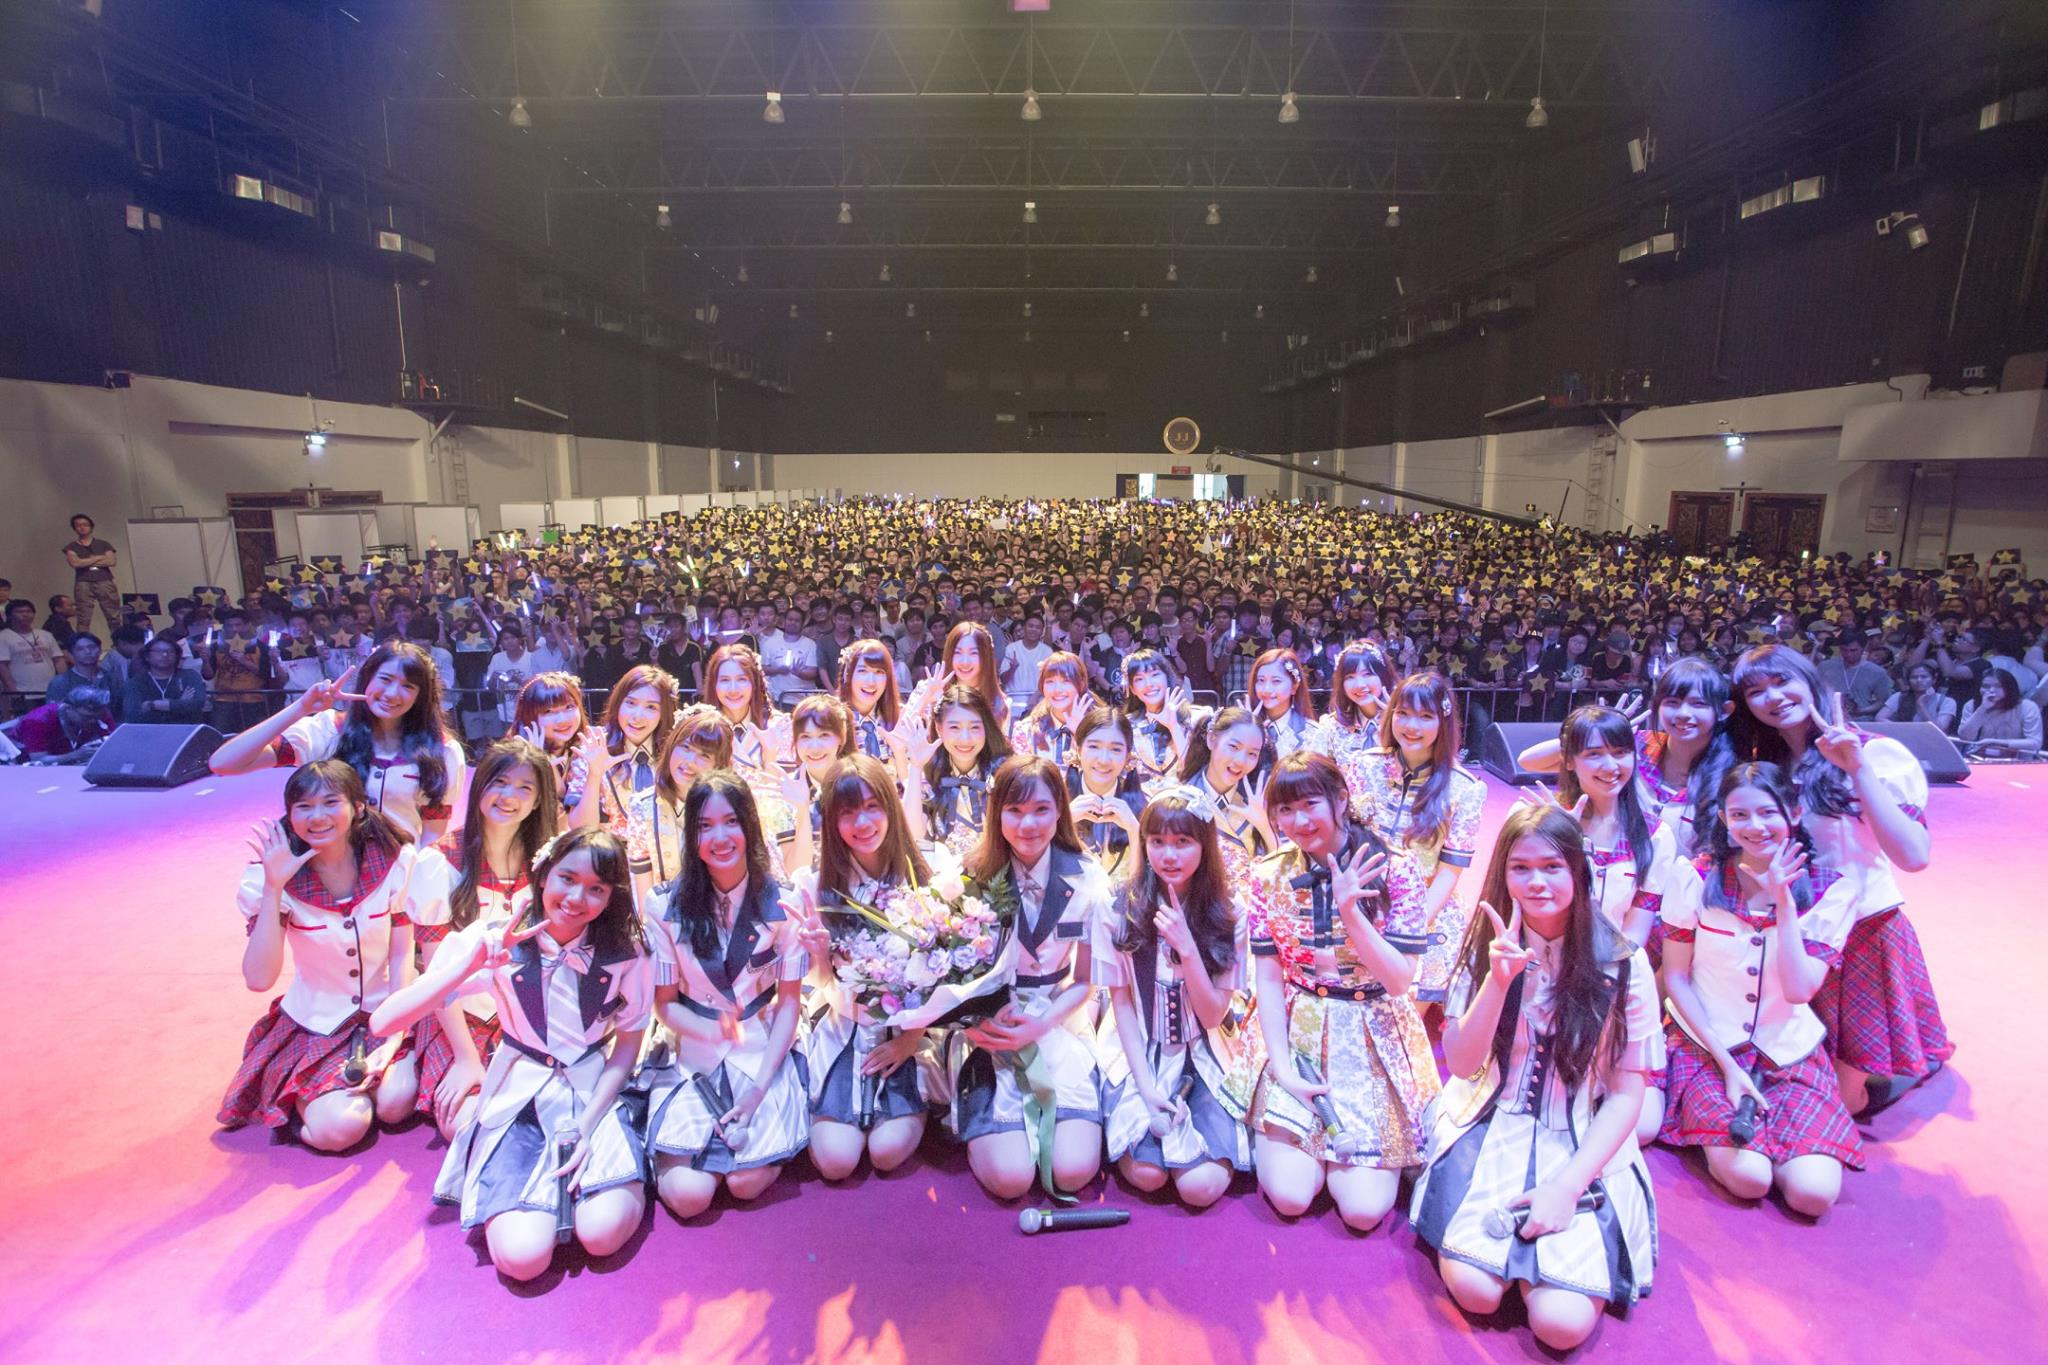 BNK48 Mini Concert from BNK48 Mini Live and Handshake @ JJ Mall